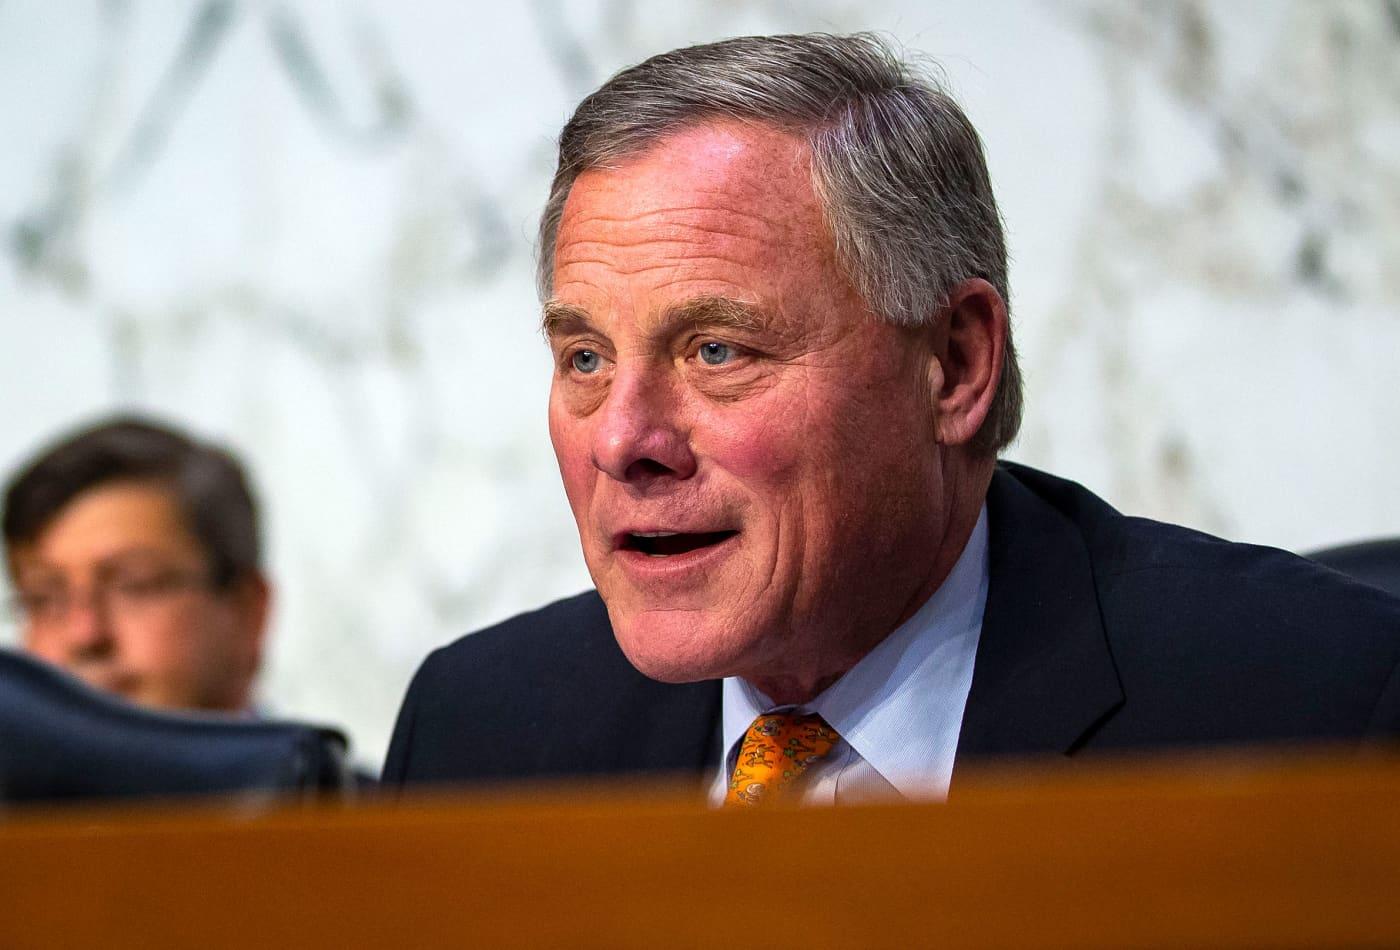 Two GOP senators face questions over stock sales ahead of the market's coronavirus slide